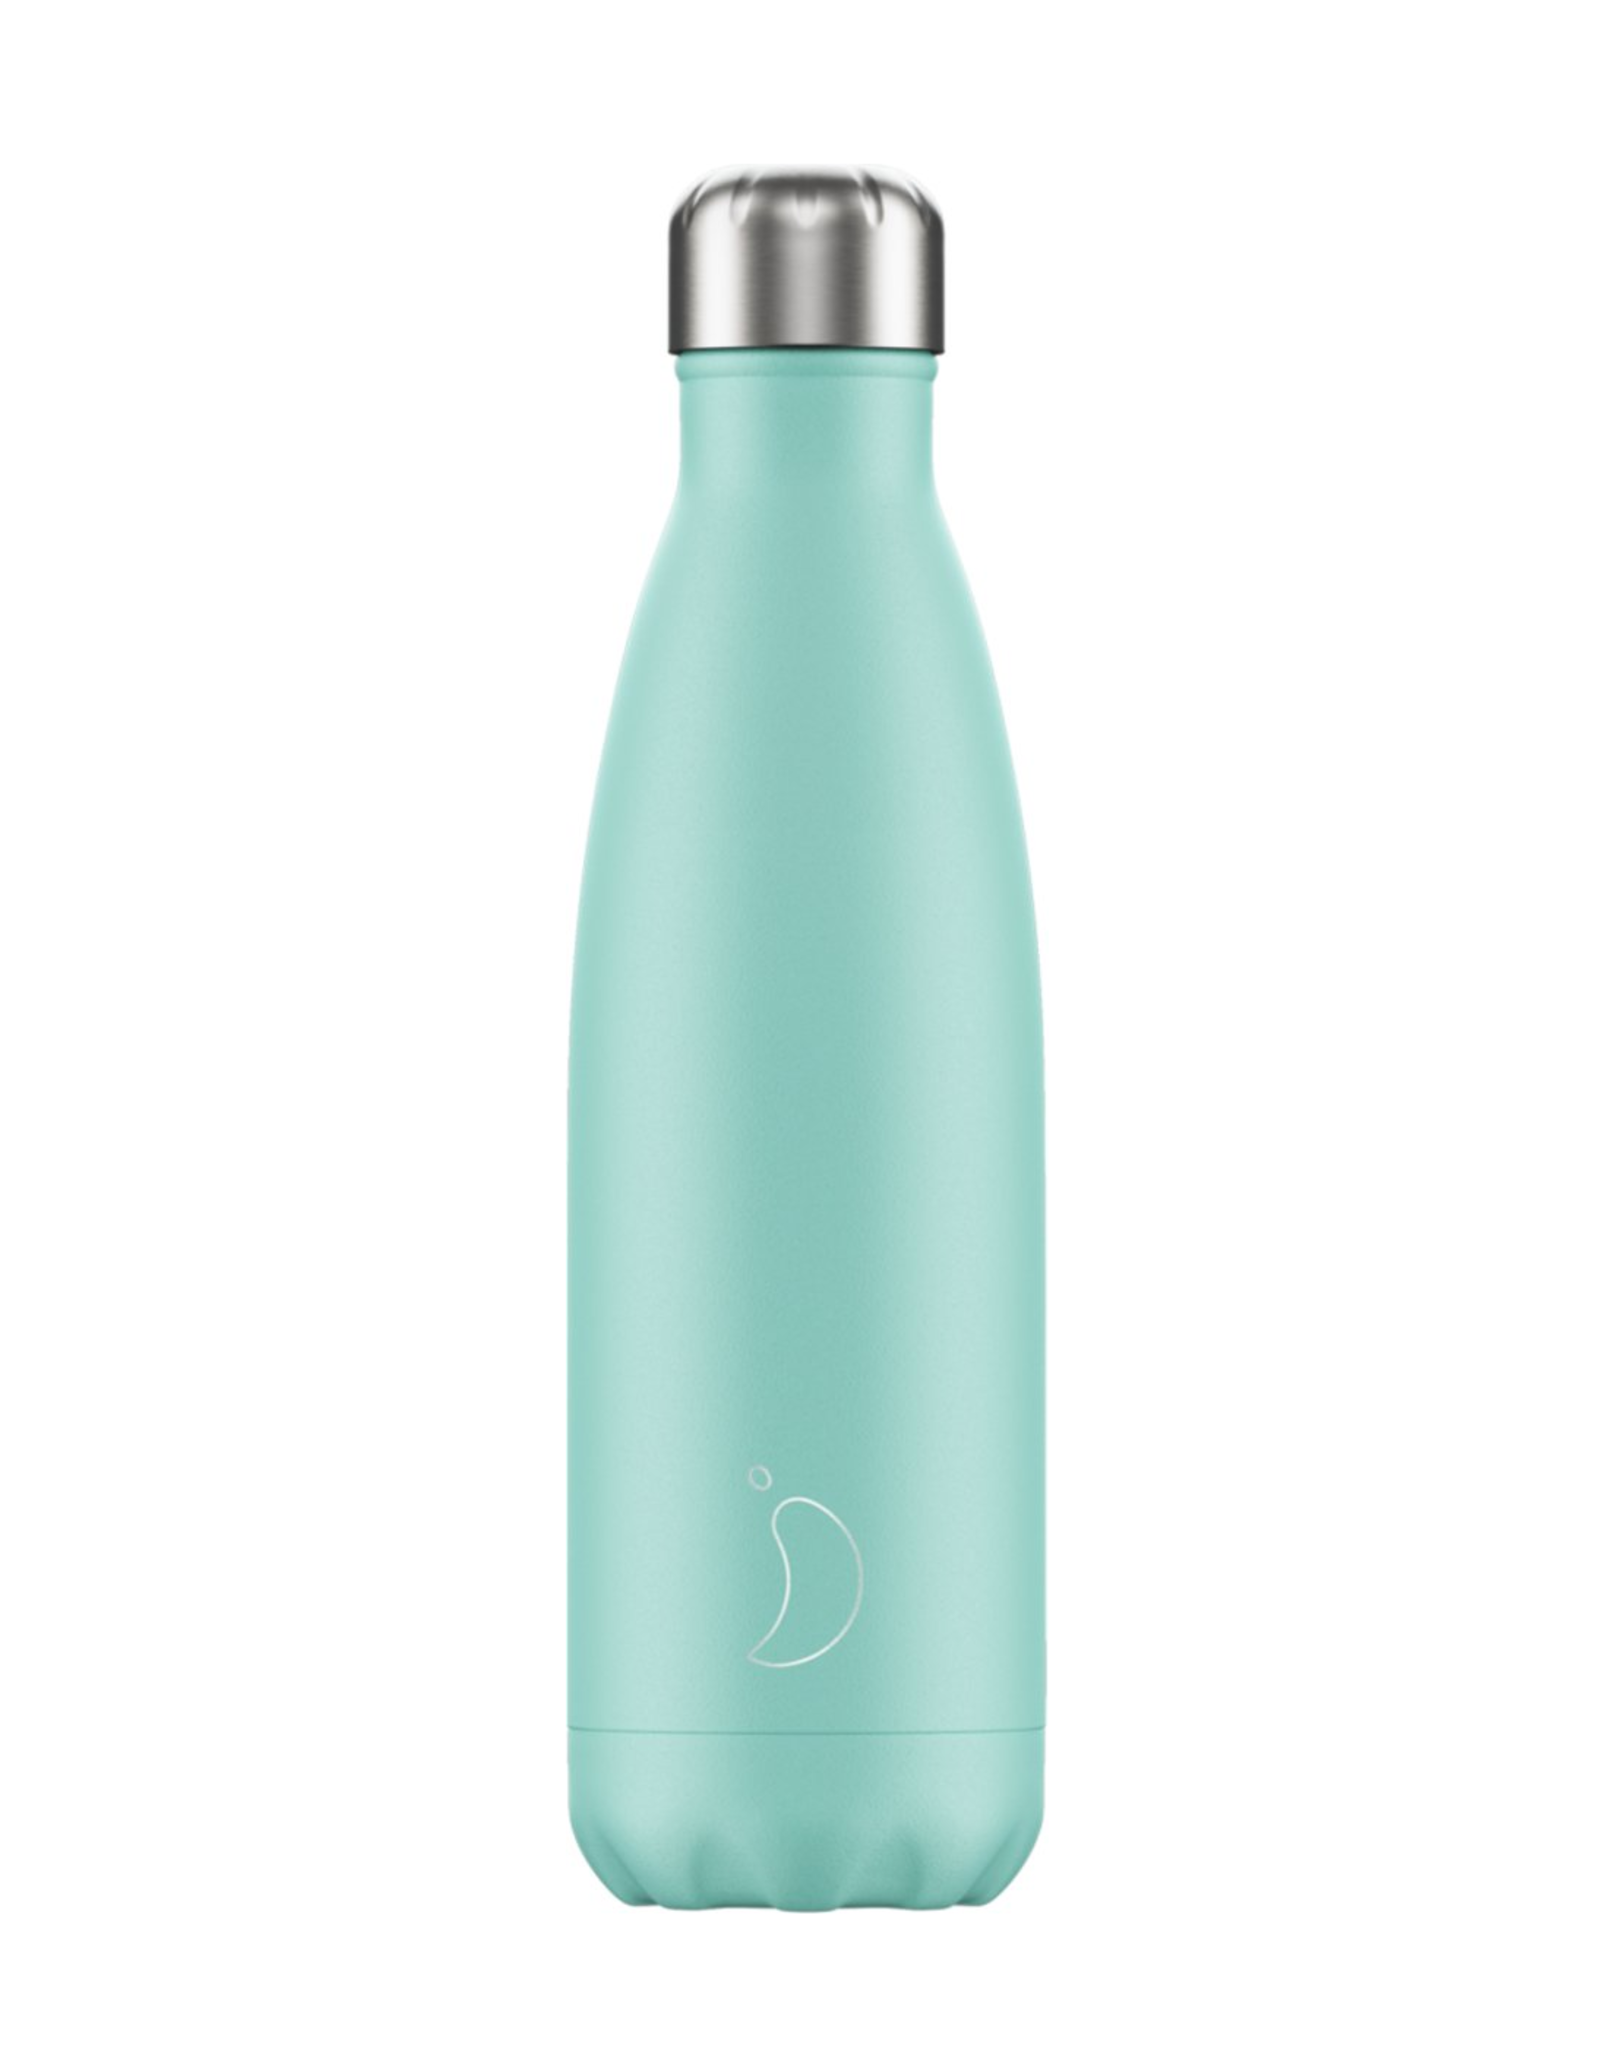 Chilly's Bottles Chilly's Bottle Pastel Groen 500ml - Chilly's Bottles